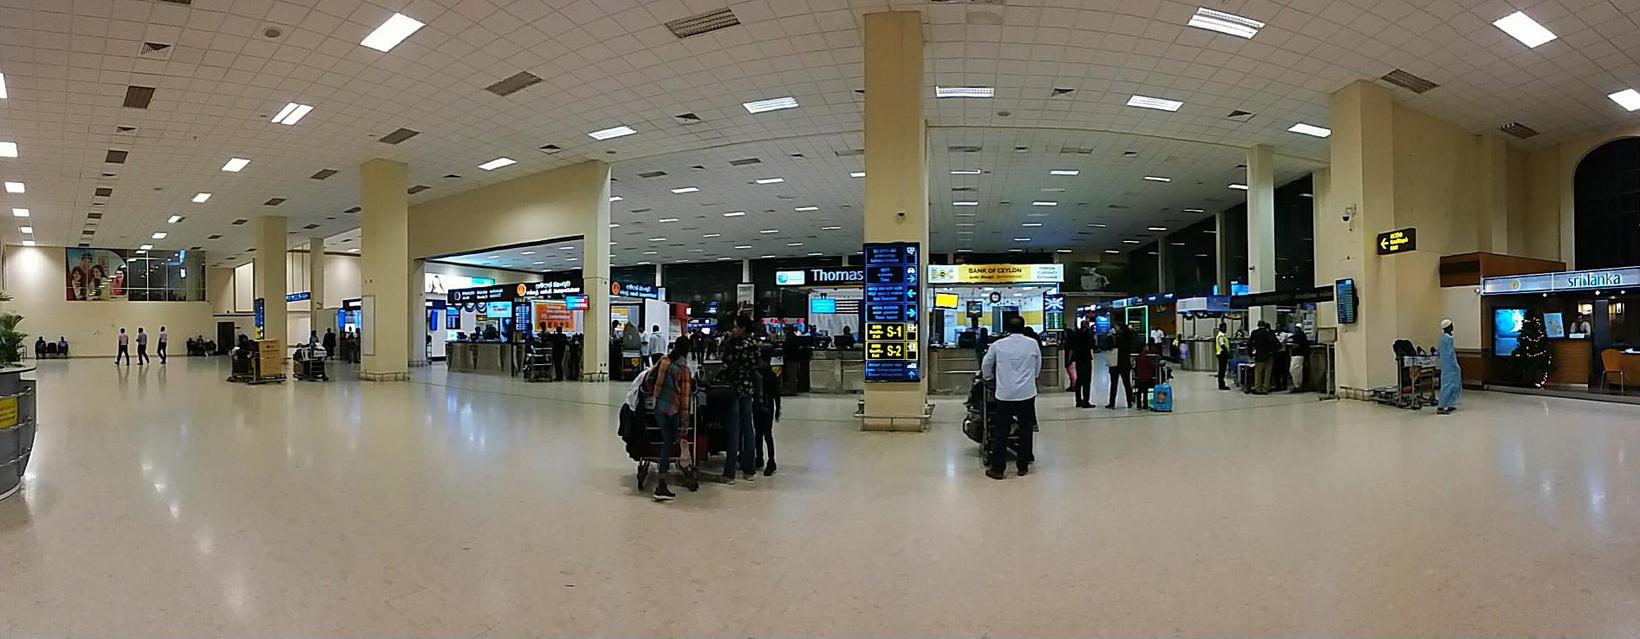 Bandaranaike-international-airport-in-Colombo